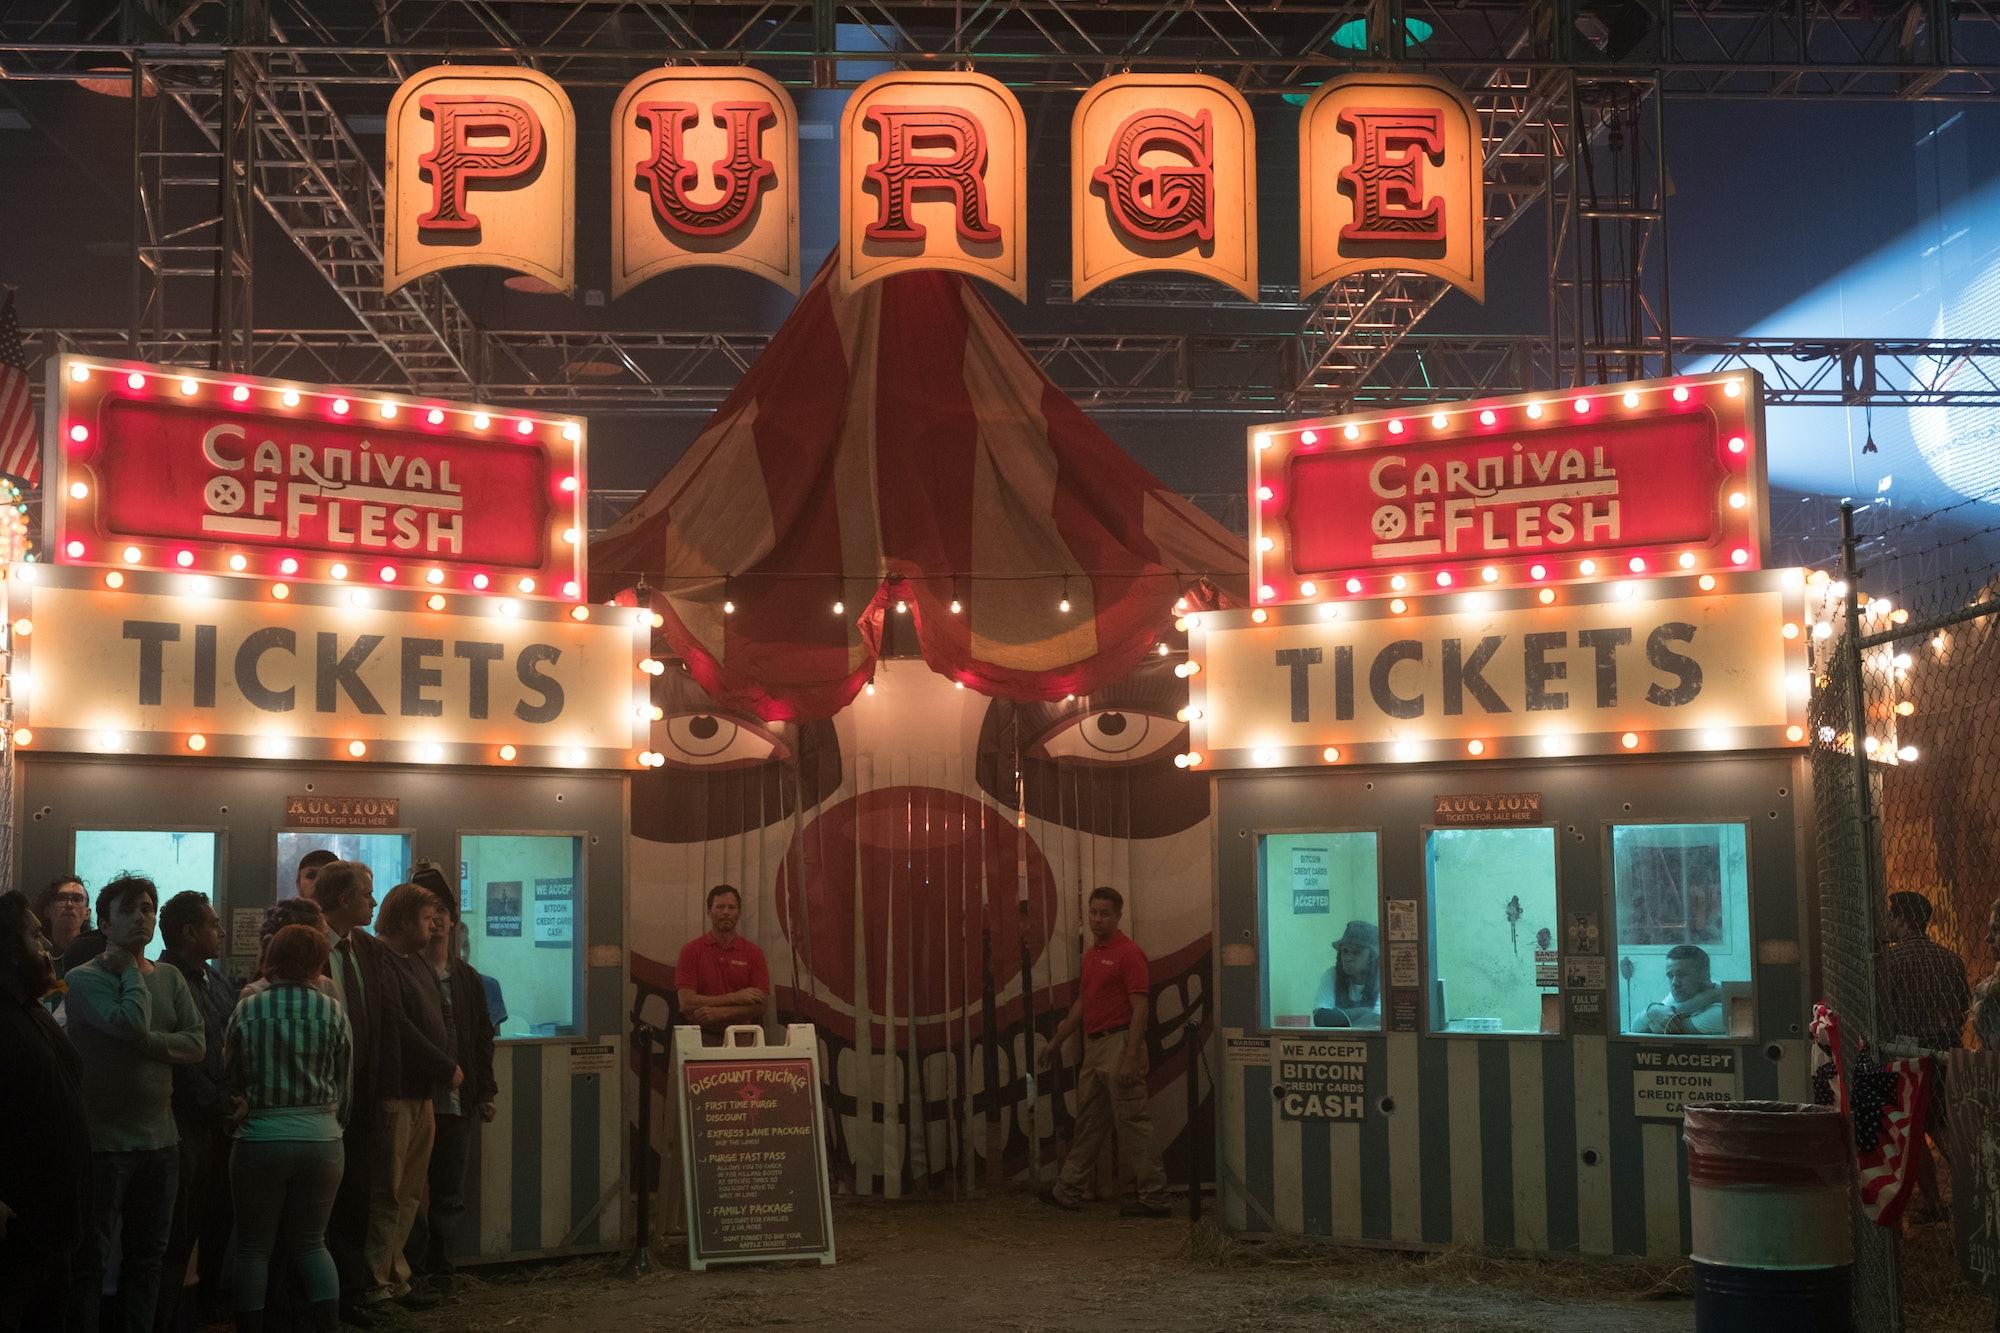 'The Purge' Carnival of Flesh